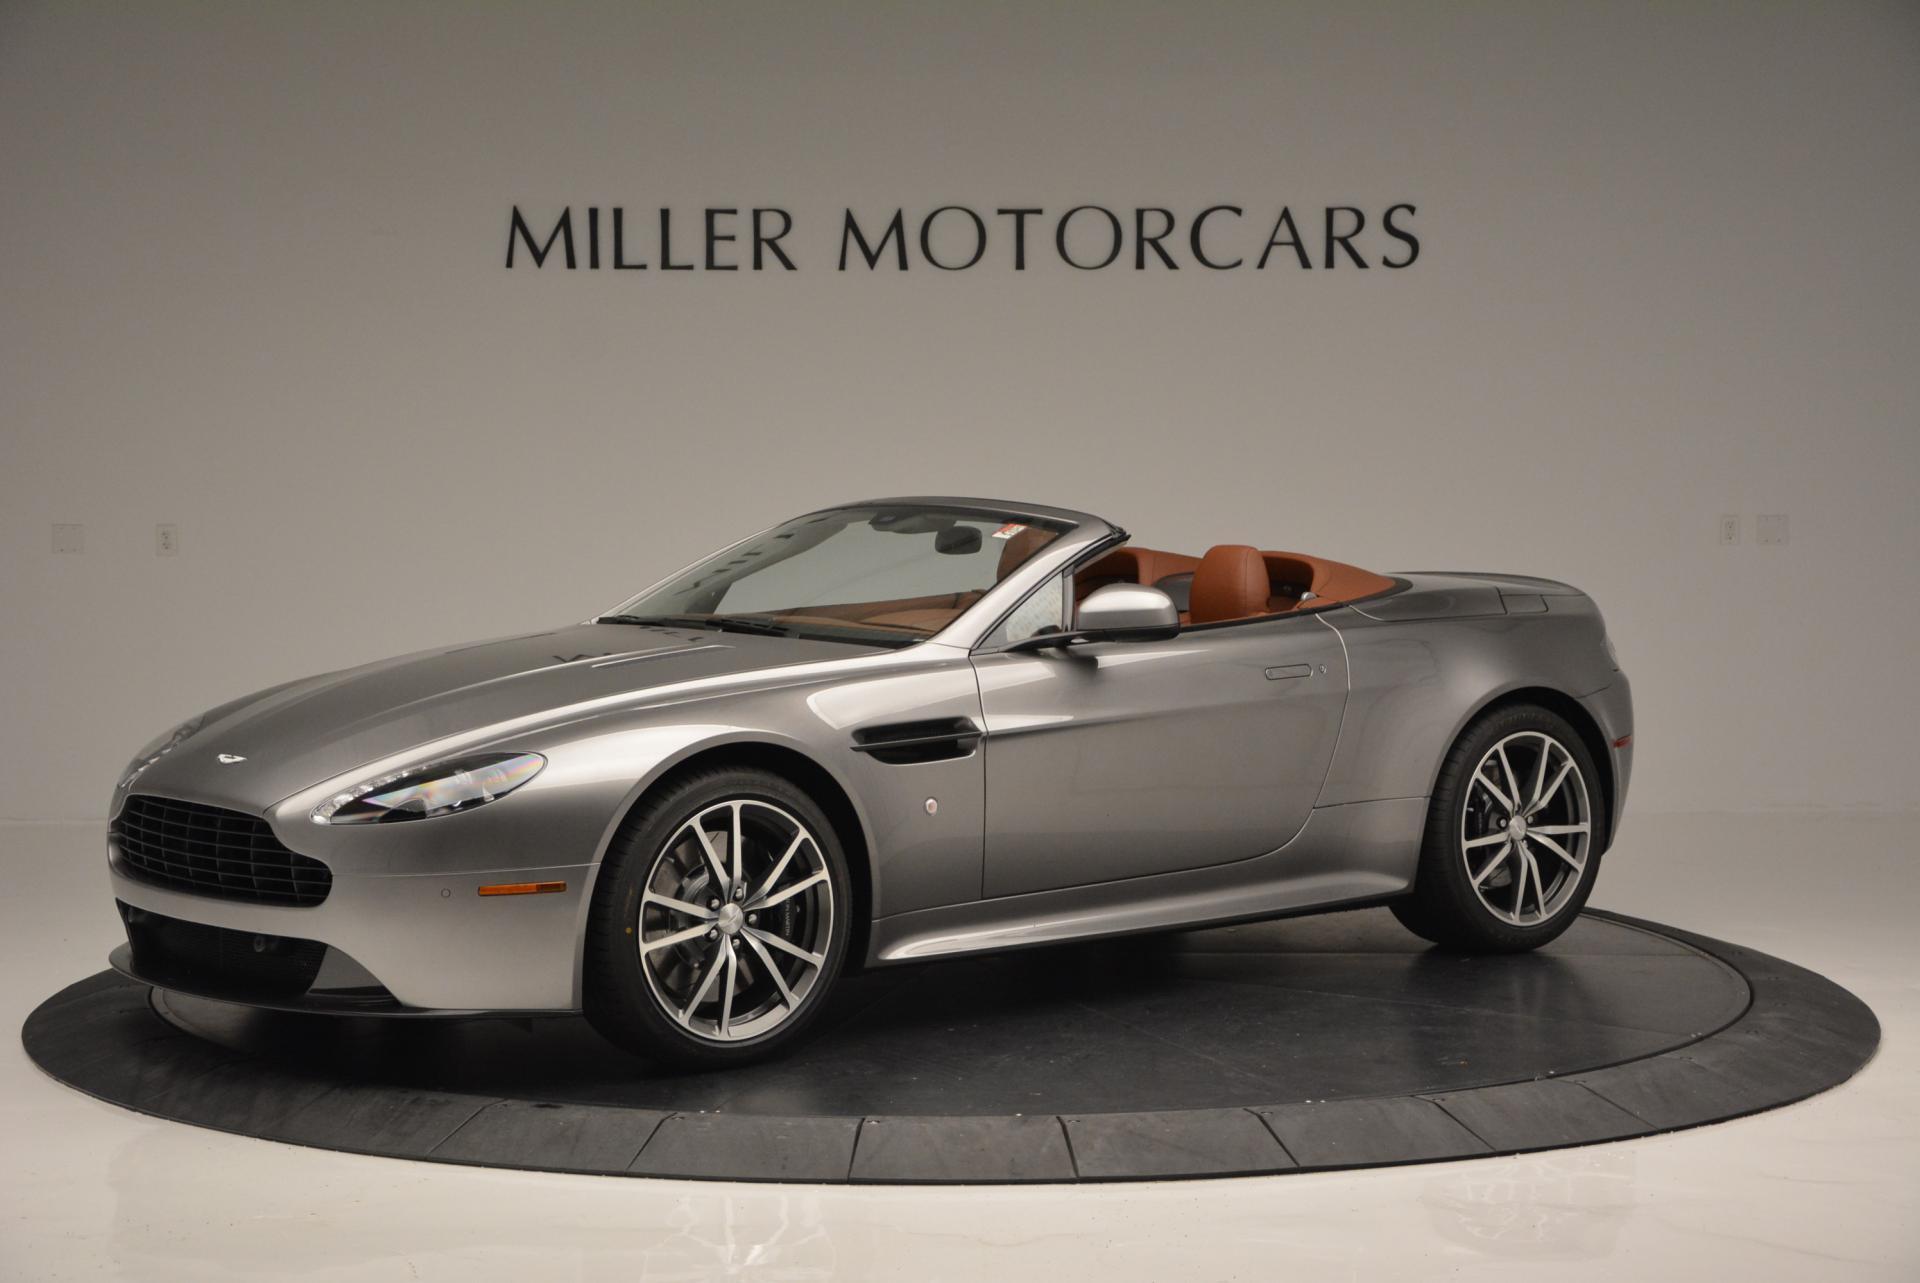 New 2016 Aston Martin V8 Vantage S  For Sale In Greenwich, CT 88_p2